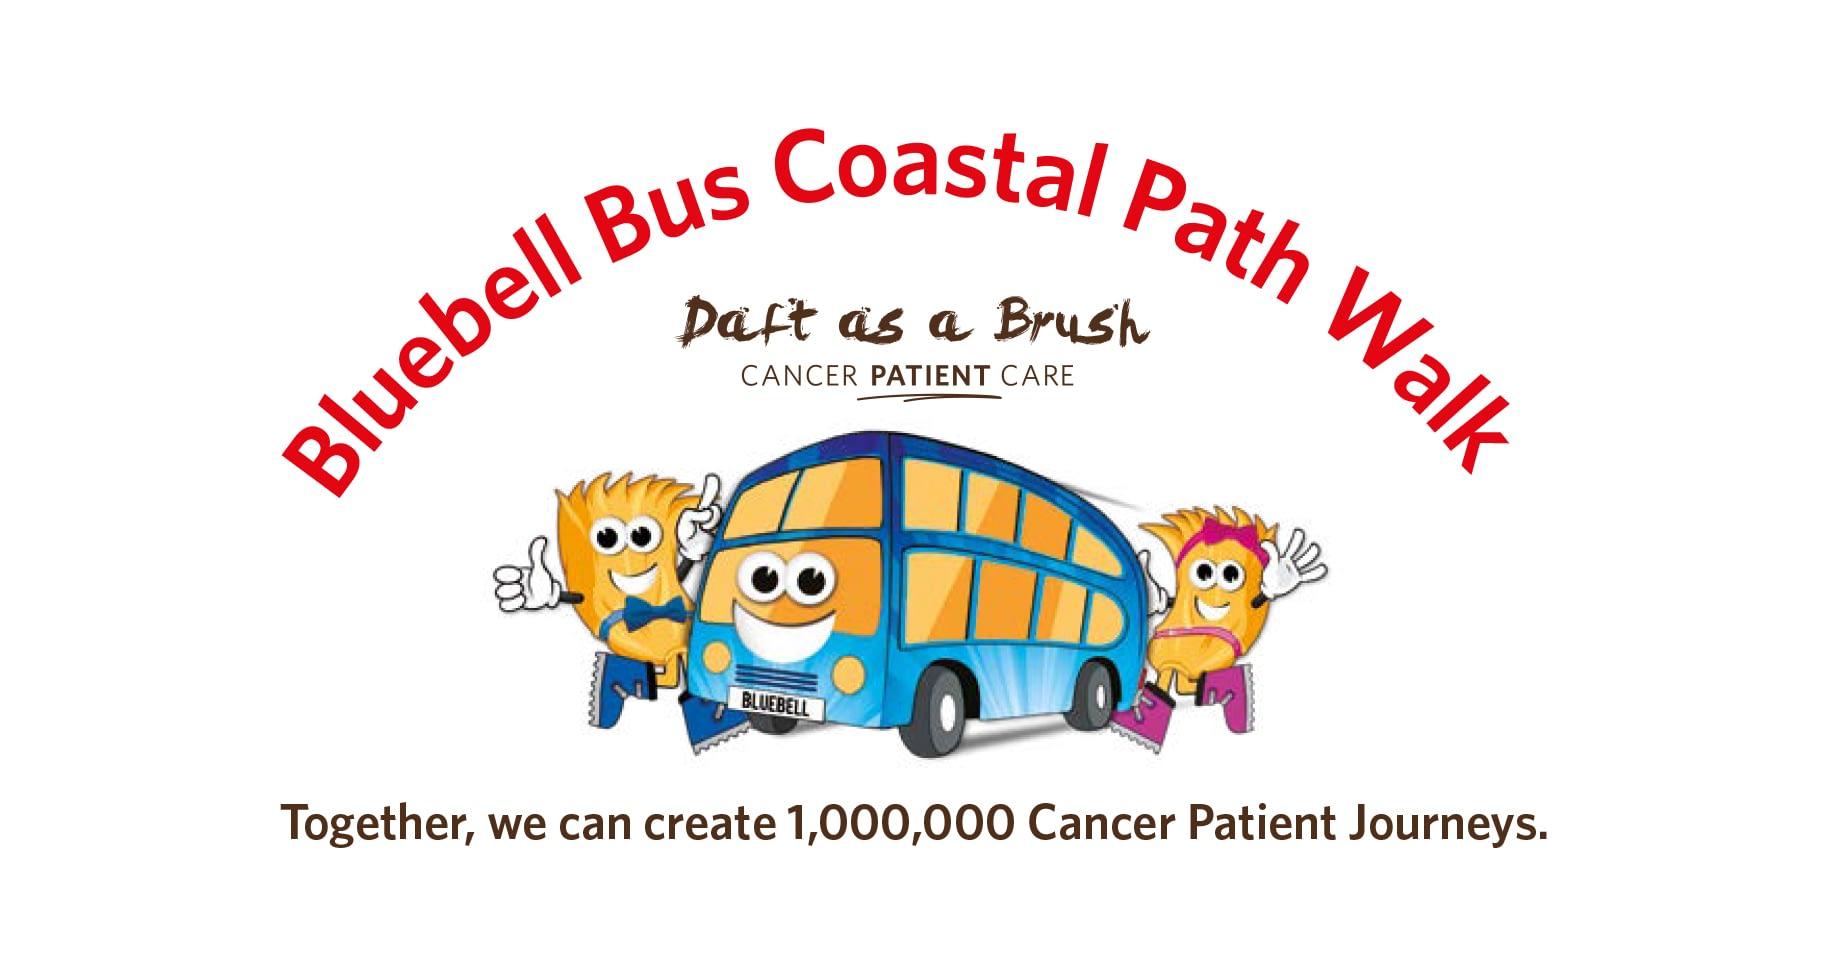 Daft as a Brush Charity Path Walk